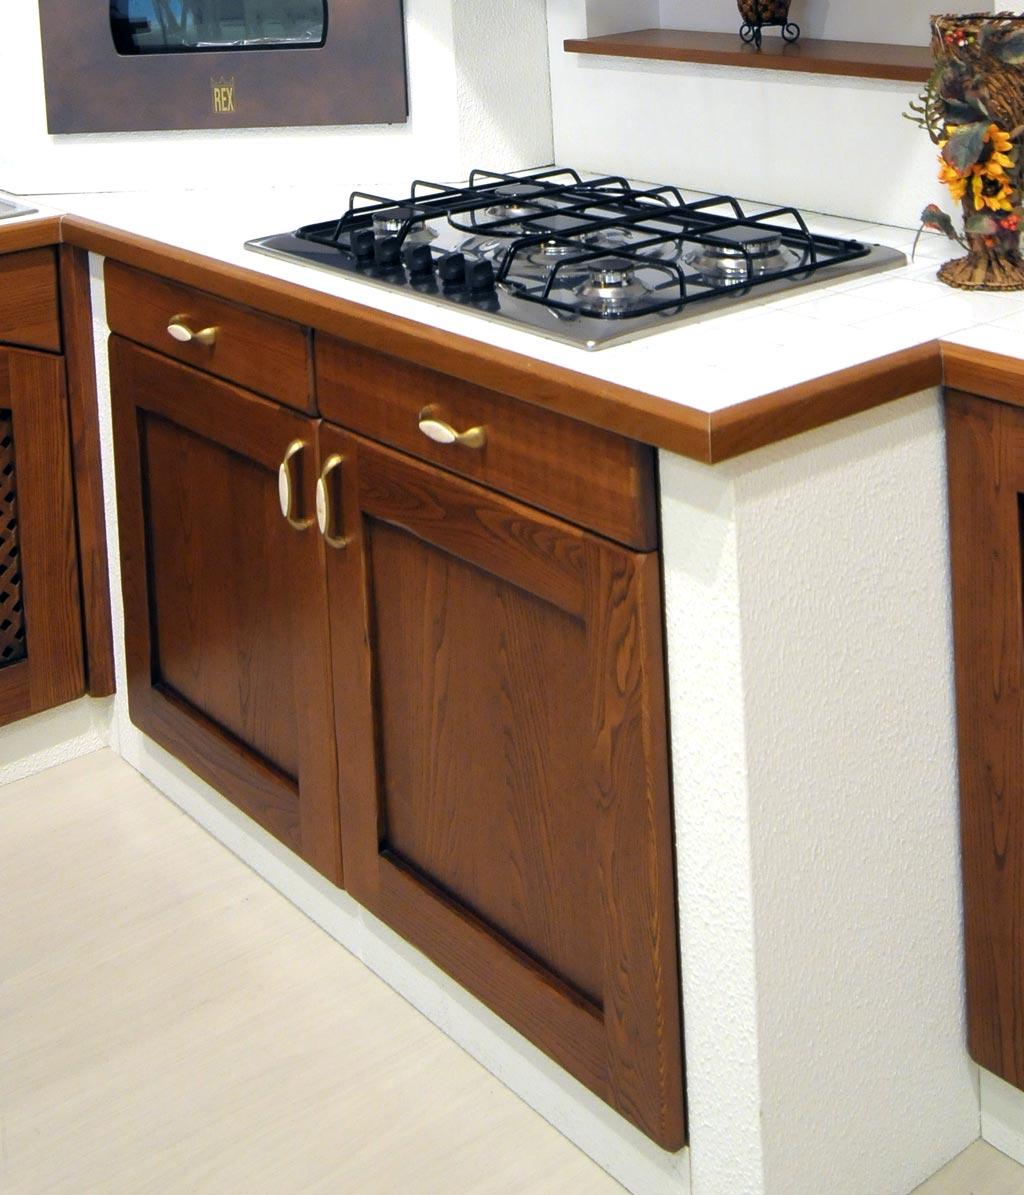 Cucina finta muratura tosca castagno rivenditori - Cucine in finta muratura ...